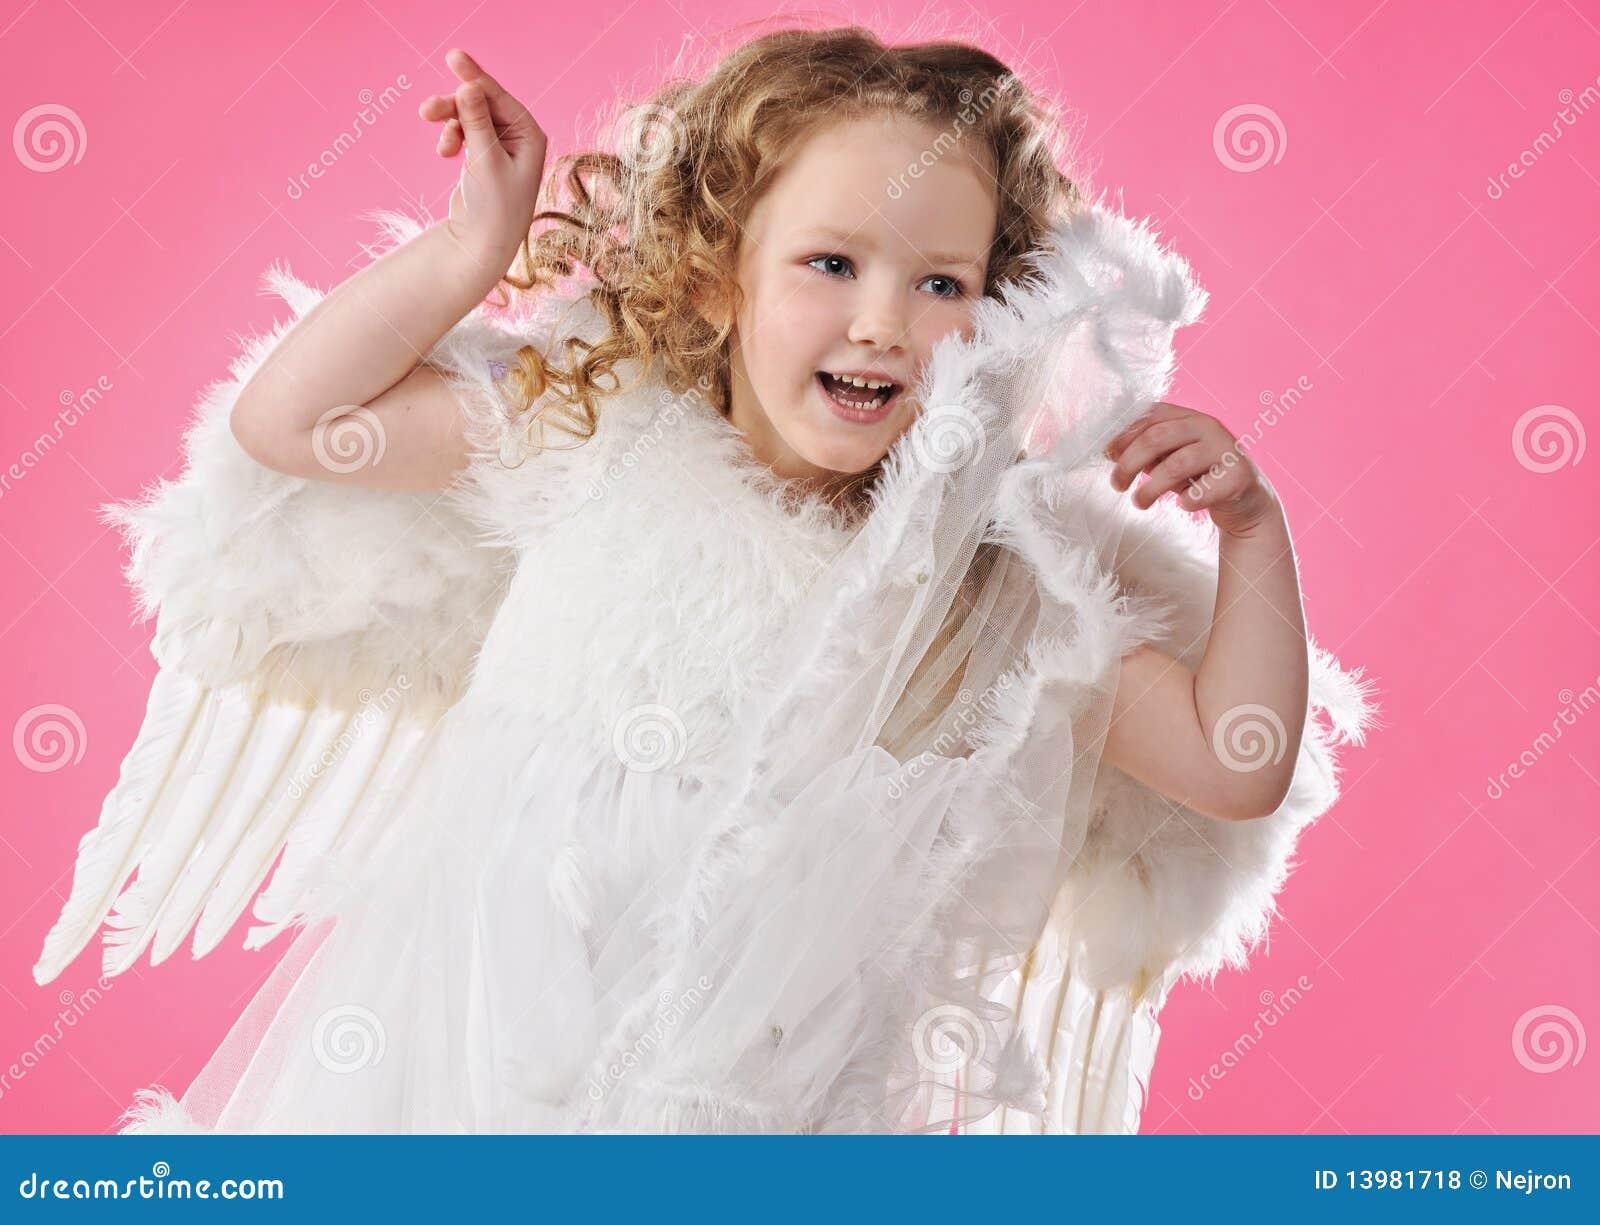 little angel girl bath time